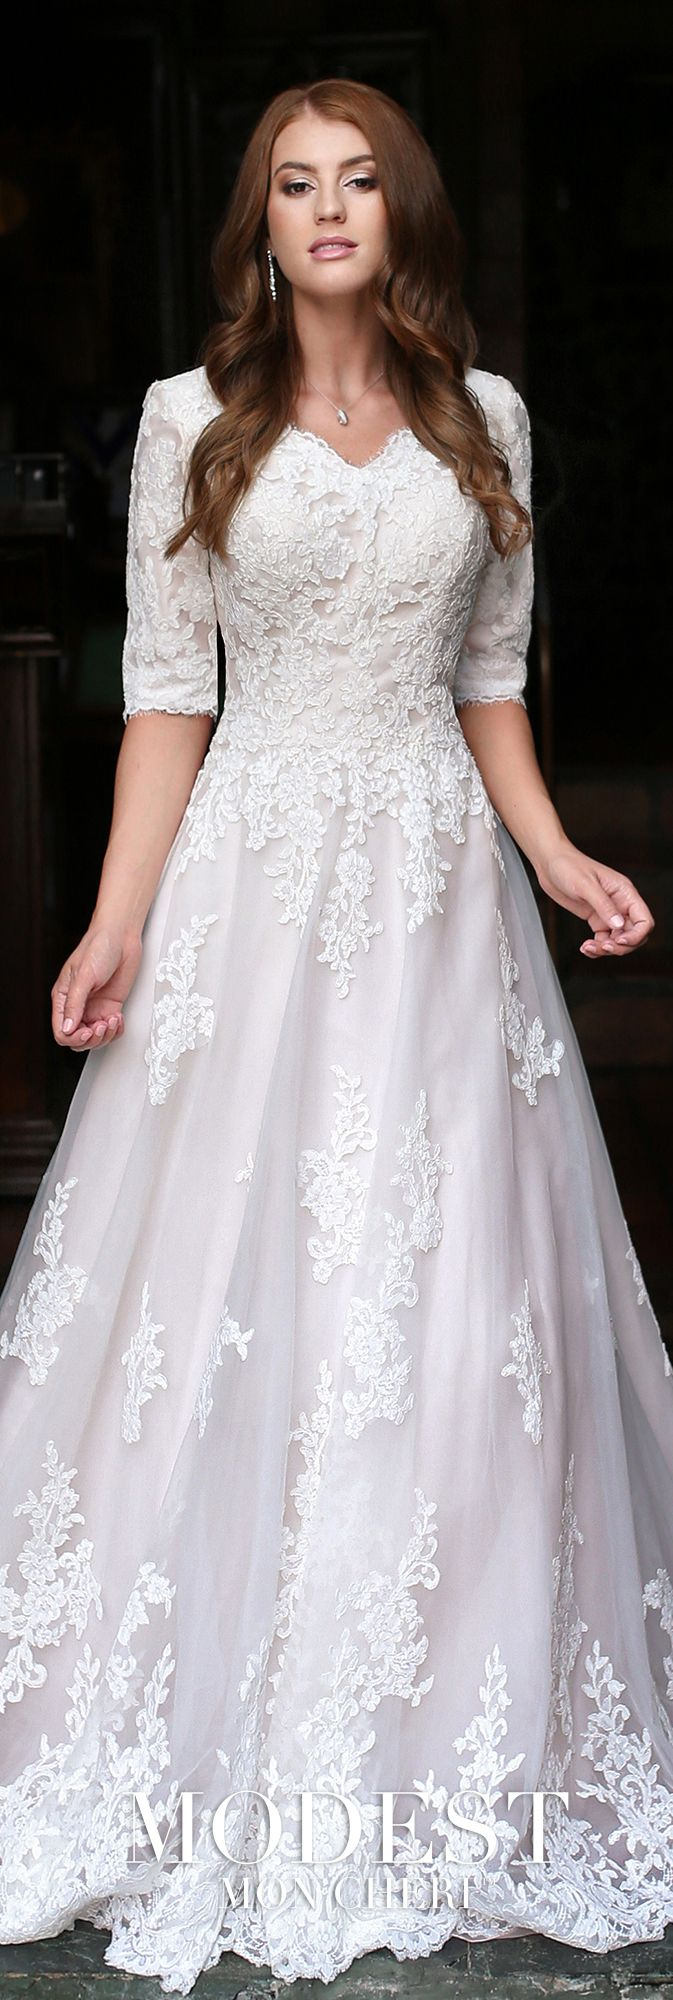 Modest Wedding Dresses Modest By Mon Cheri Modest Wedding Dresses Wedding Dresses Modest Wedding Gowns [ 2000 x 673 Pixel ]